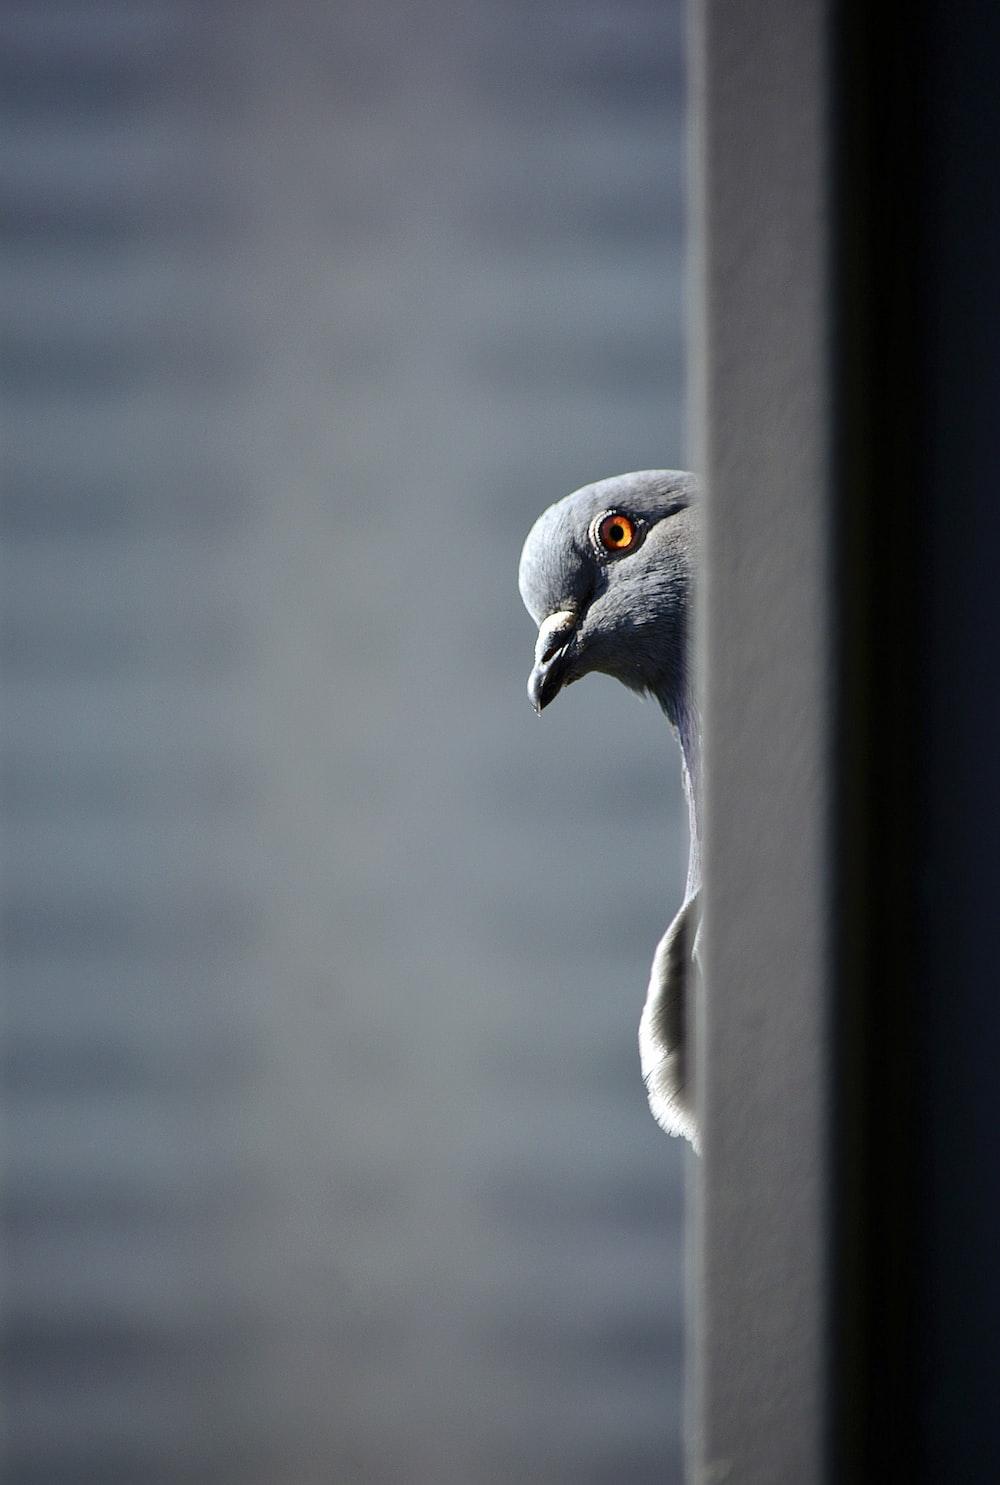 gray and white bird on gray metal bar